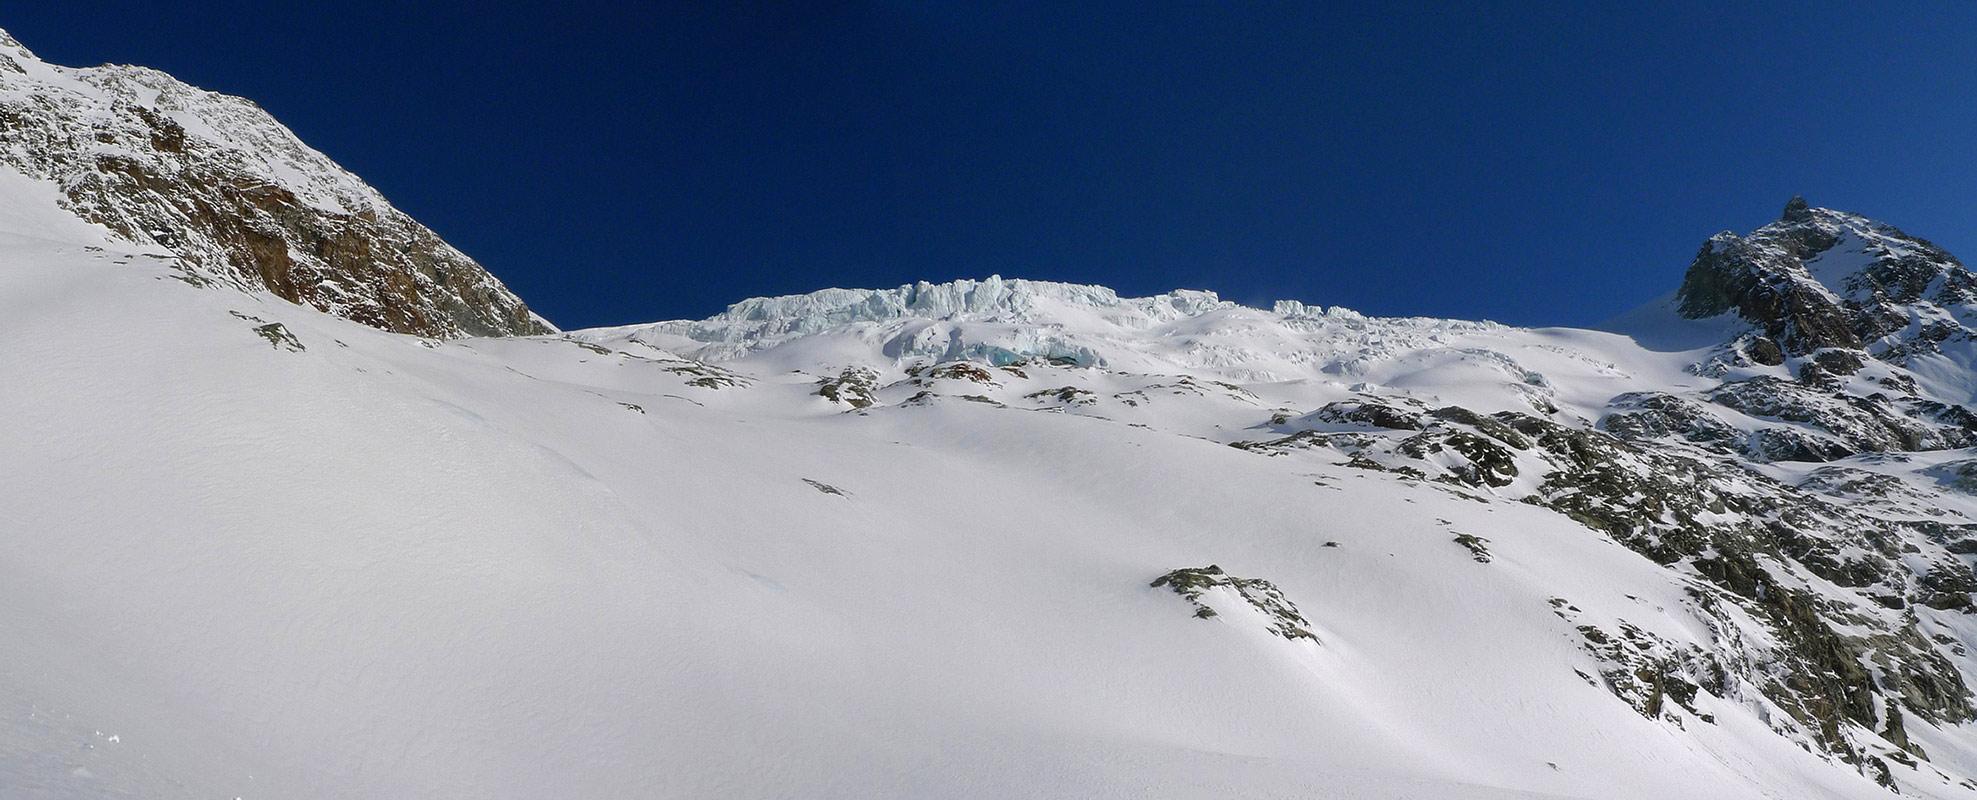 Mont Durand / Arbenhorn Walliser Alpen / Alpes valaisannes Switzerland panorama 24